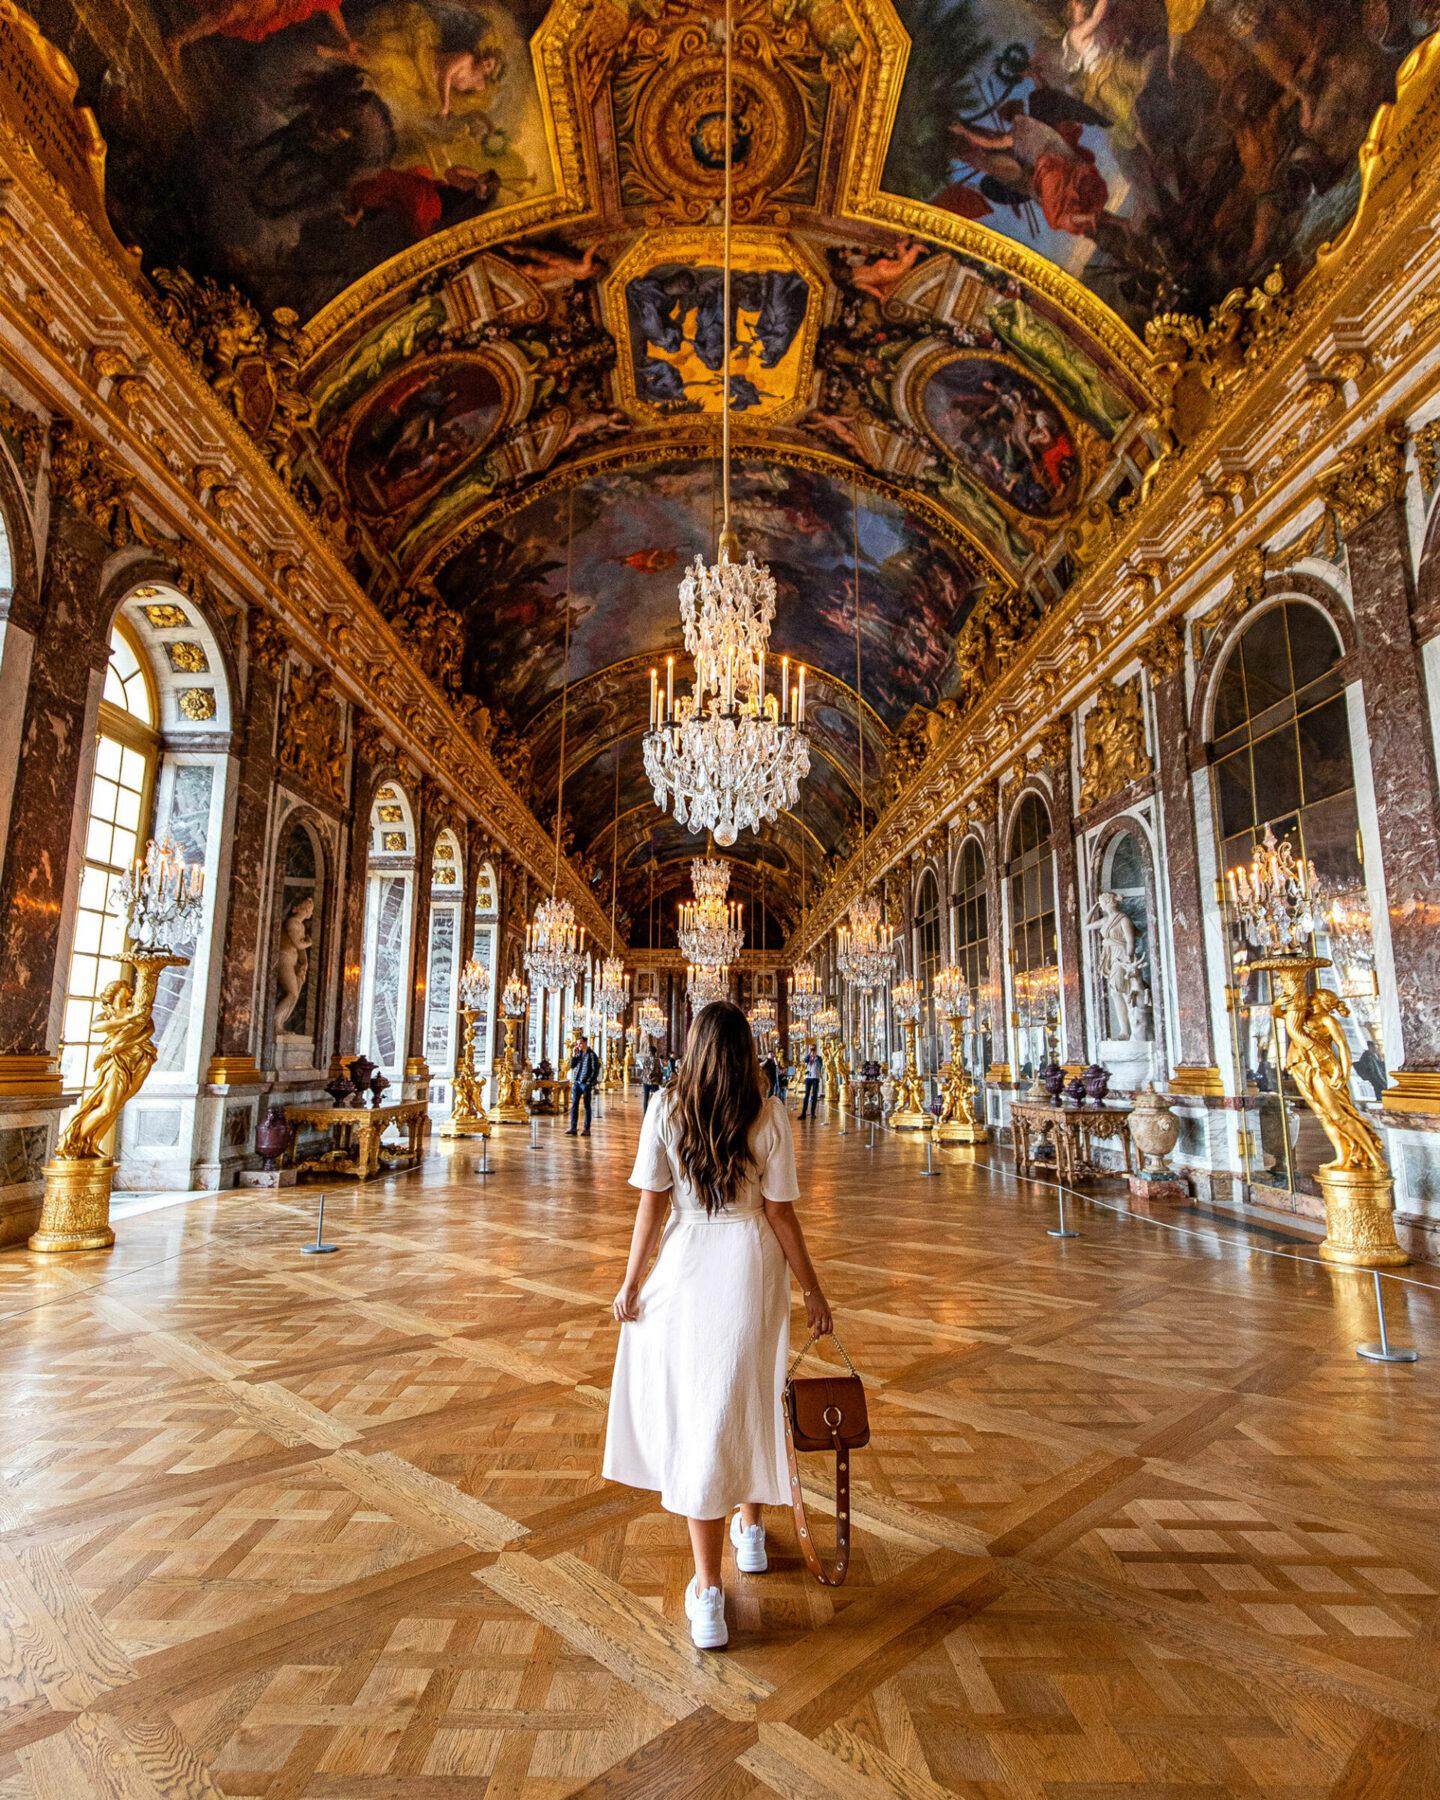 Paris Instagrammable Locations kelseyinlondon kelsey heinrichs things to do in Paris bucketlist Palace of Versailles